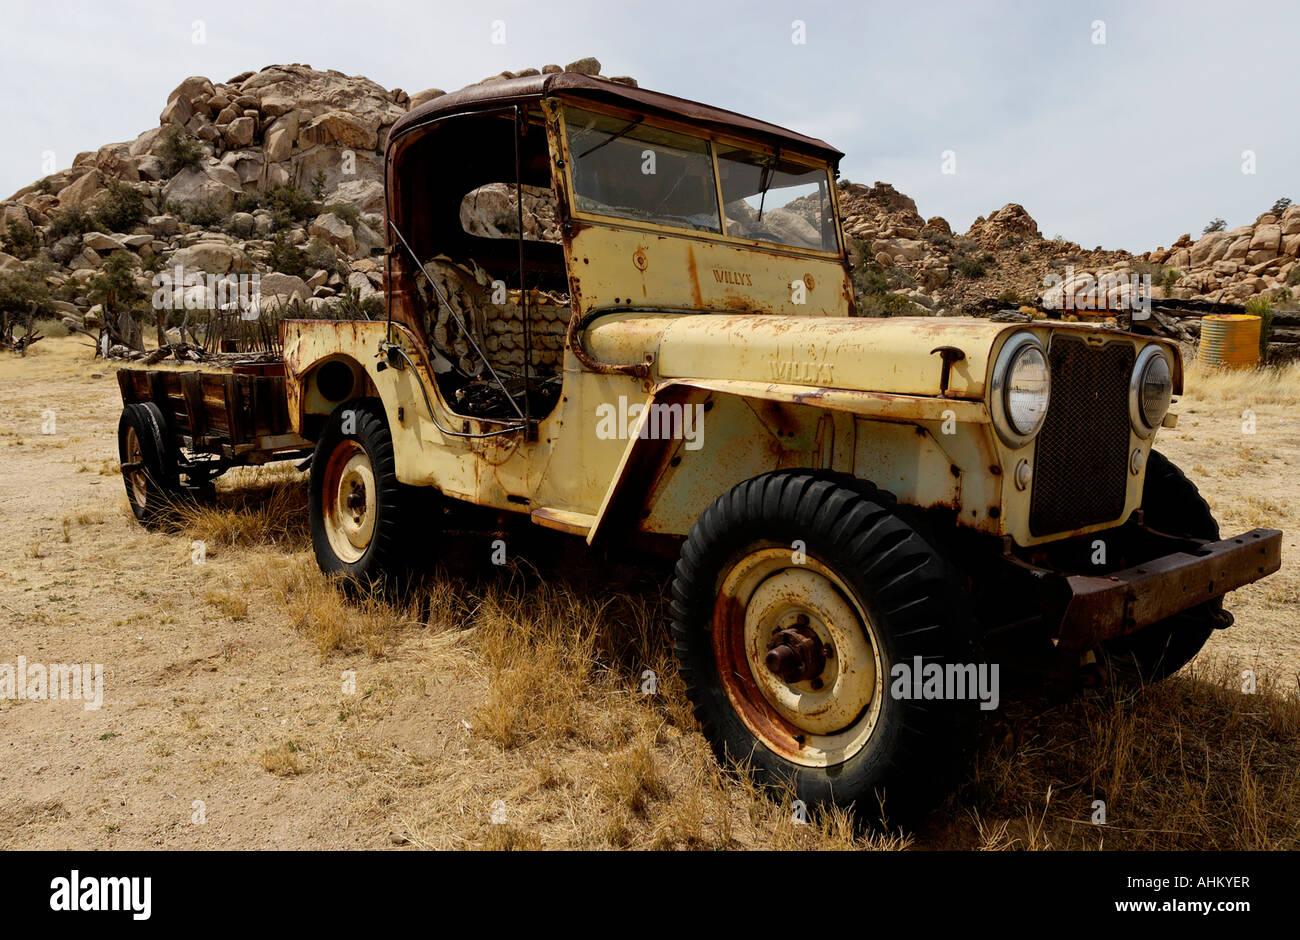 Ranch Jeep >> Willys Jeep At Keys Ranch Joshua Tree National Park Twentynine Palms